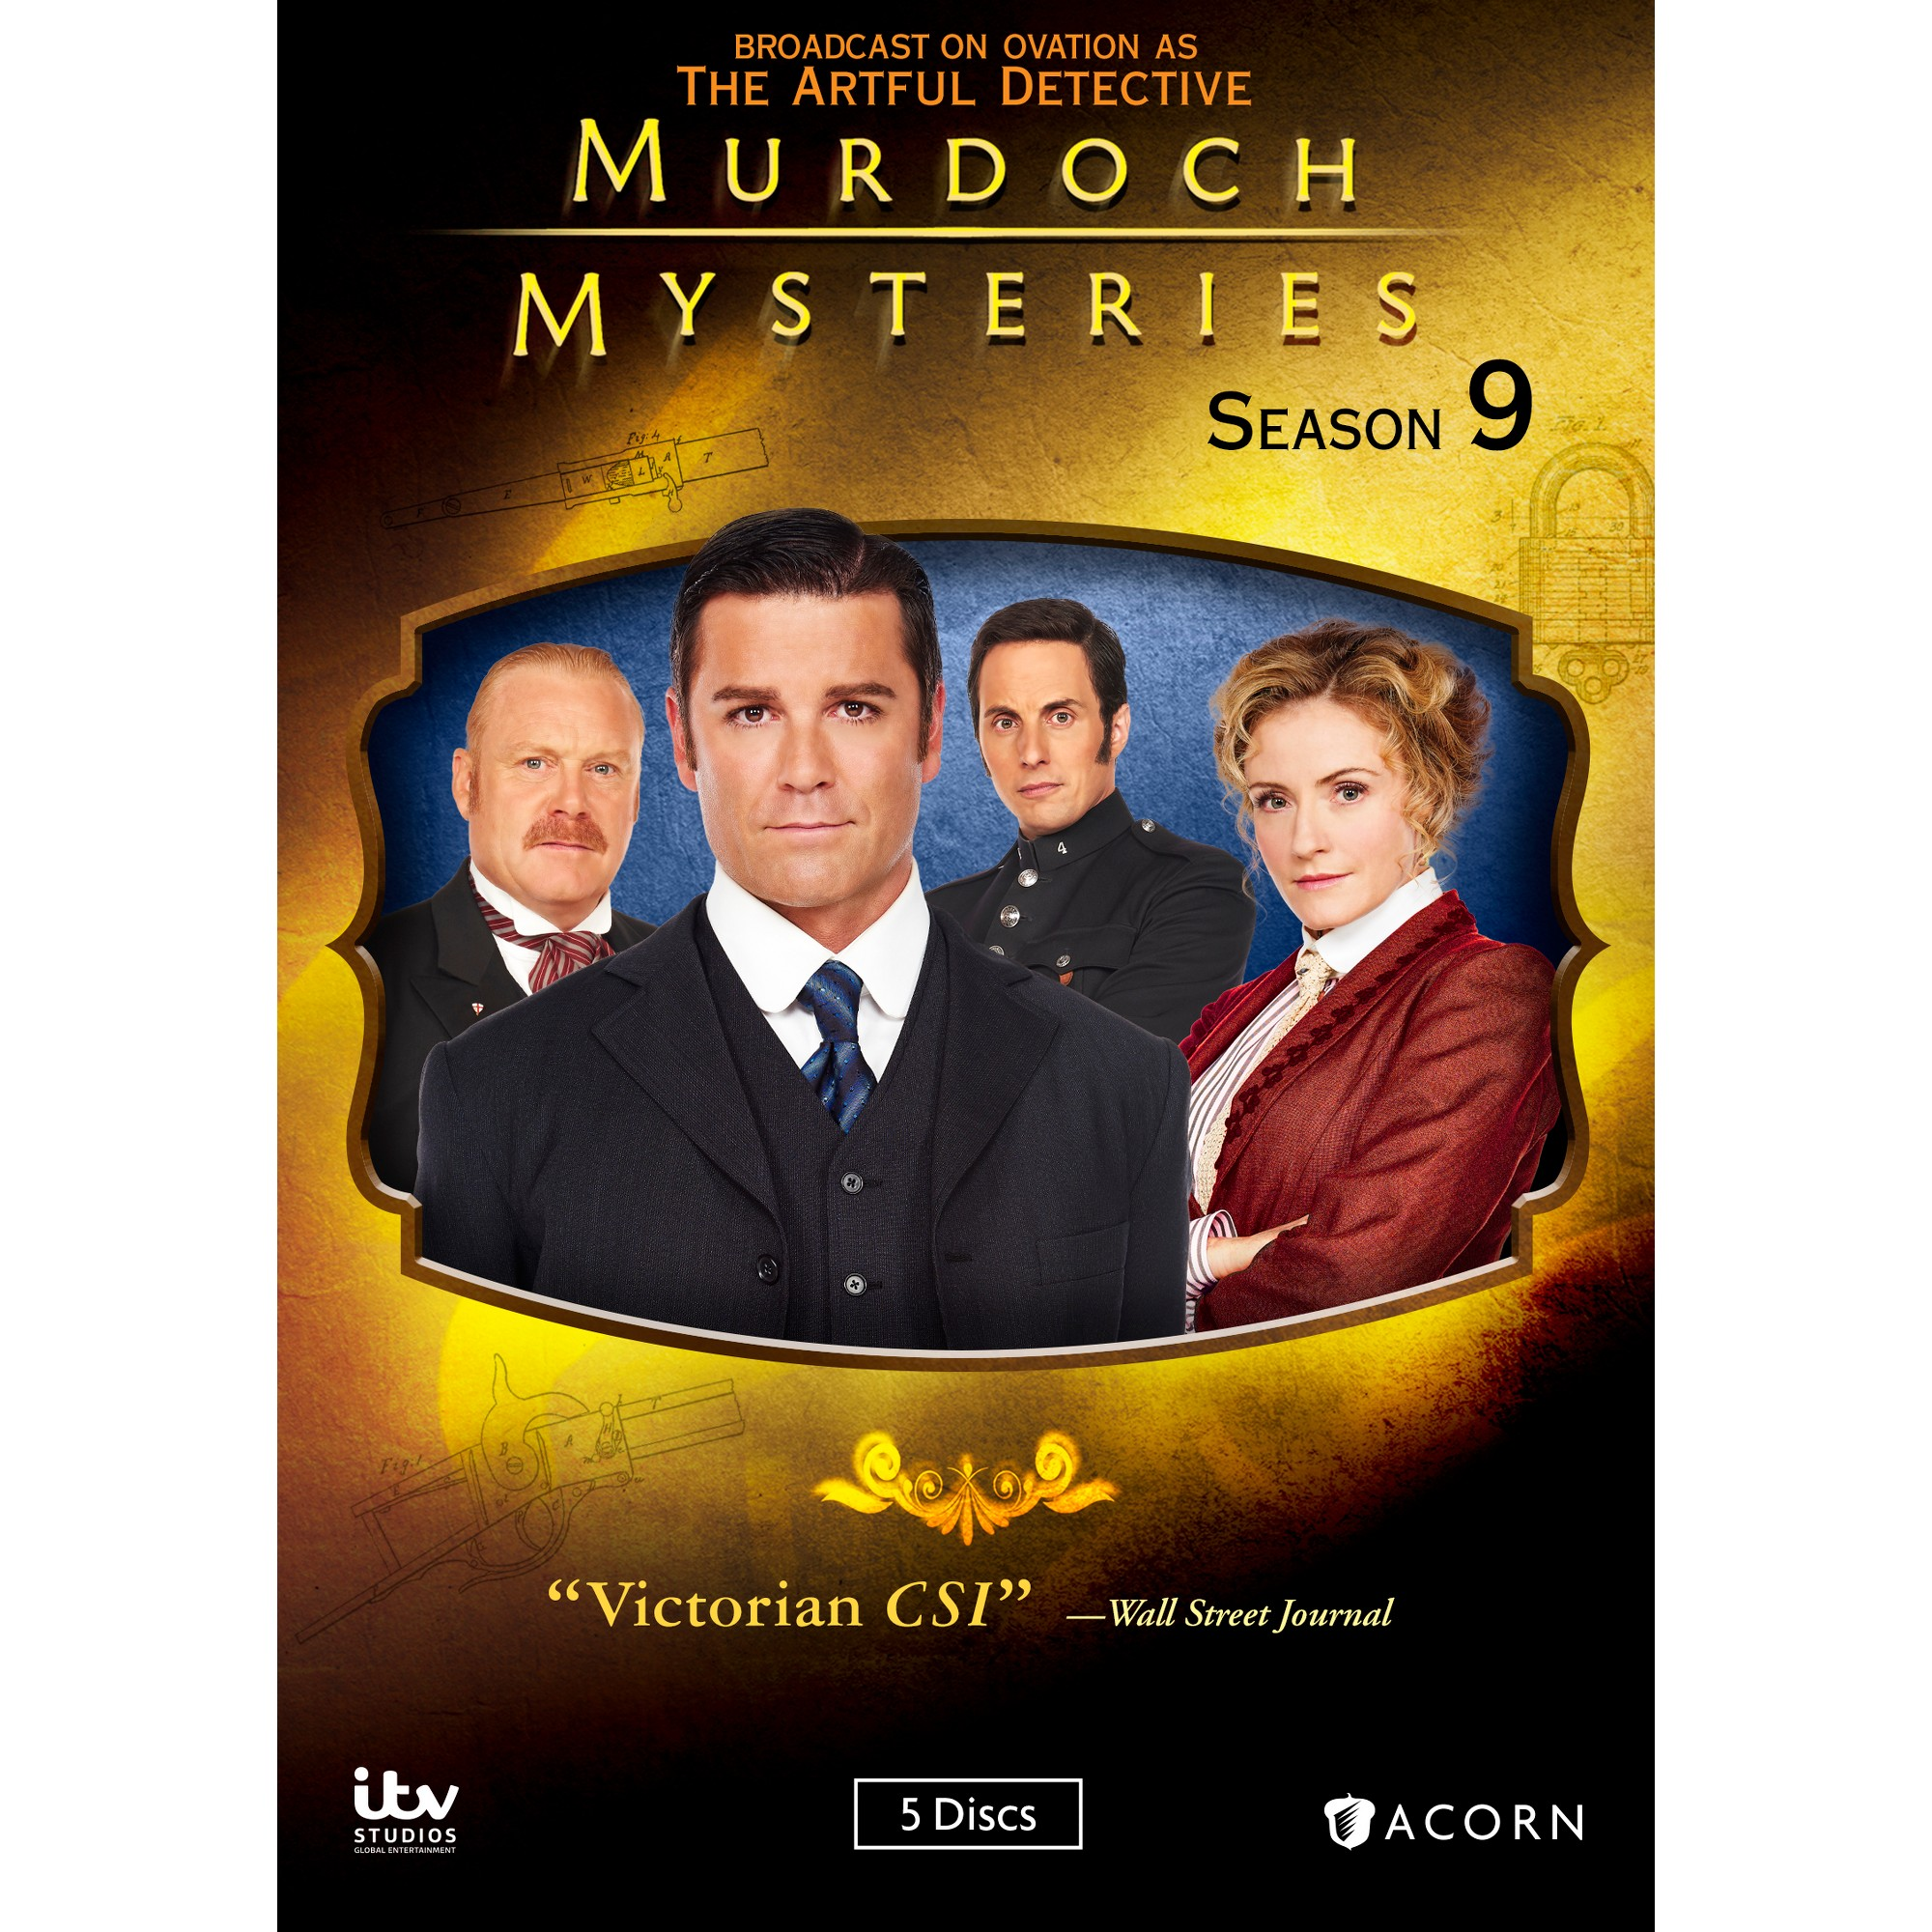 Artful Detective Christmas Special 2021 Murdoch Mysteries Season Nine Dvd 2016 In 2021 Murdoch Mysteries Mystery Mystery Novels